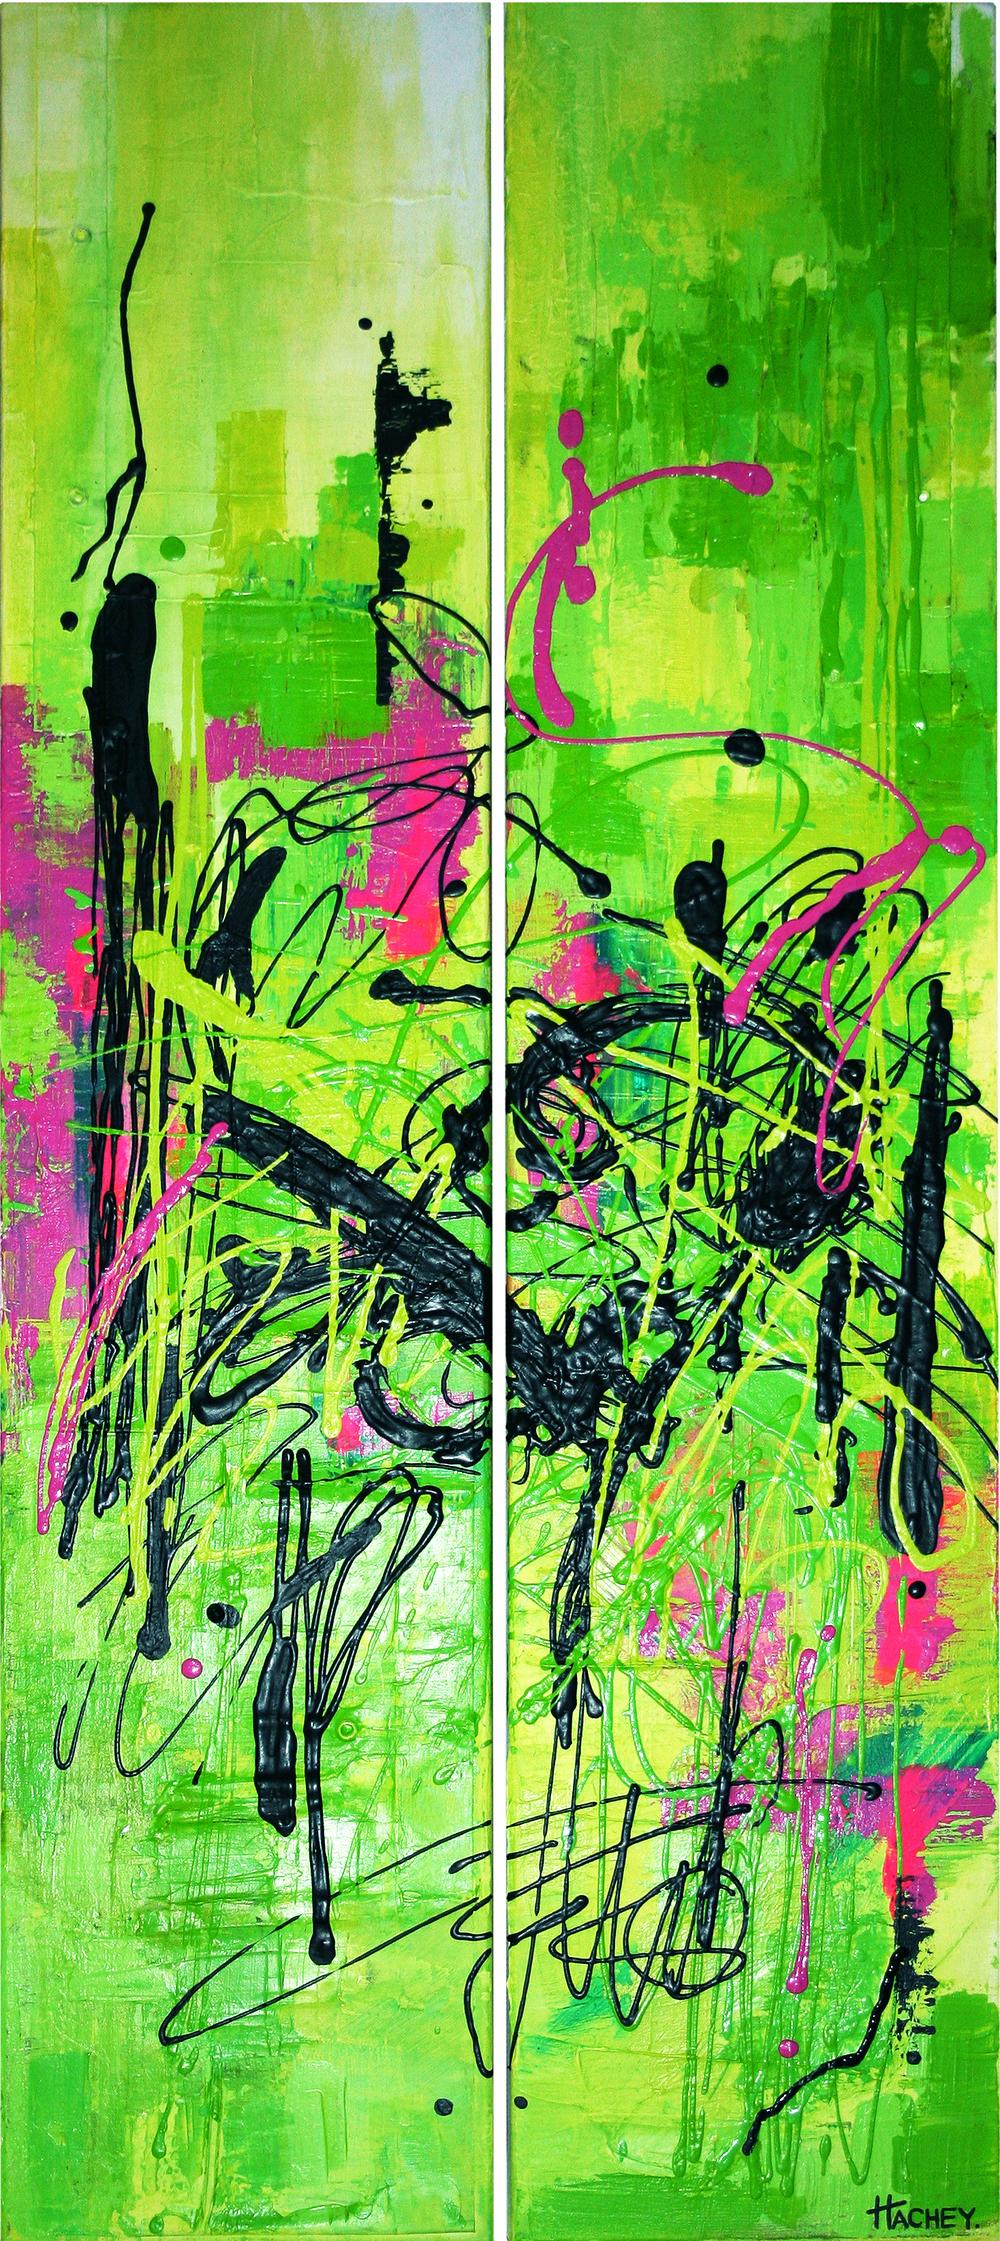 "retro 80s 20"" x 48"" acrylic on canvas SOLD"